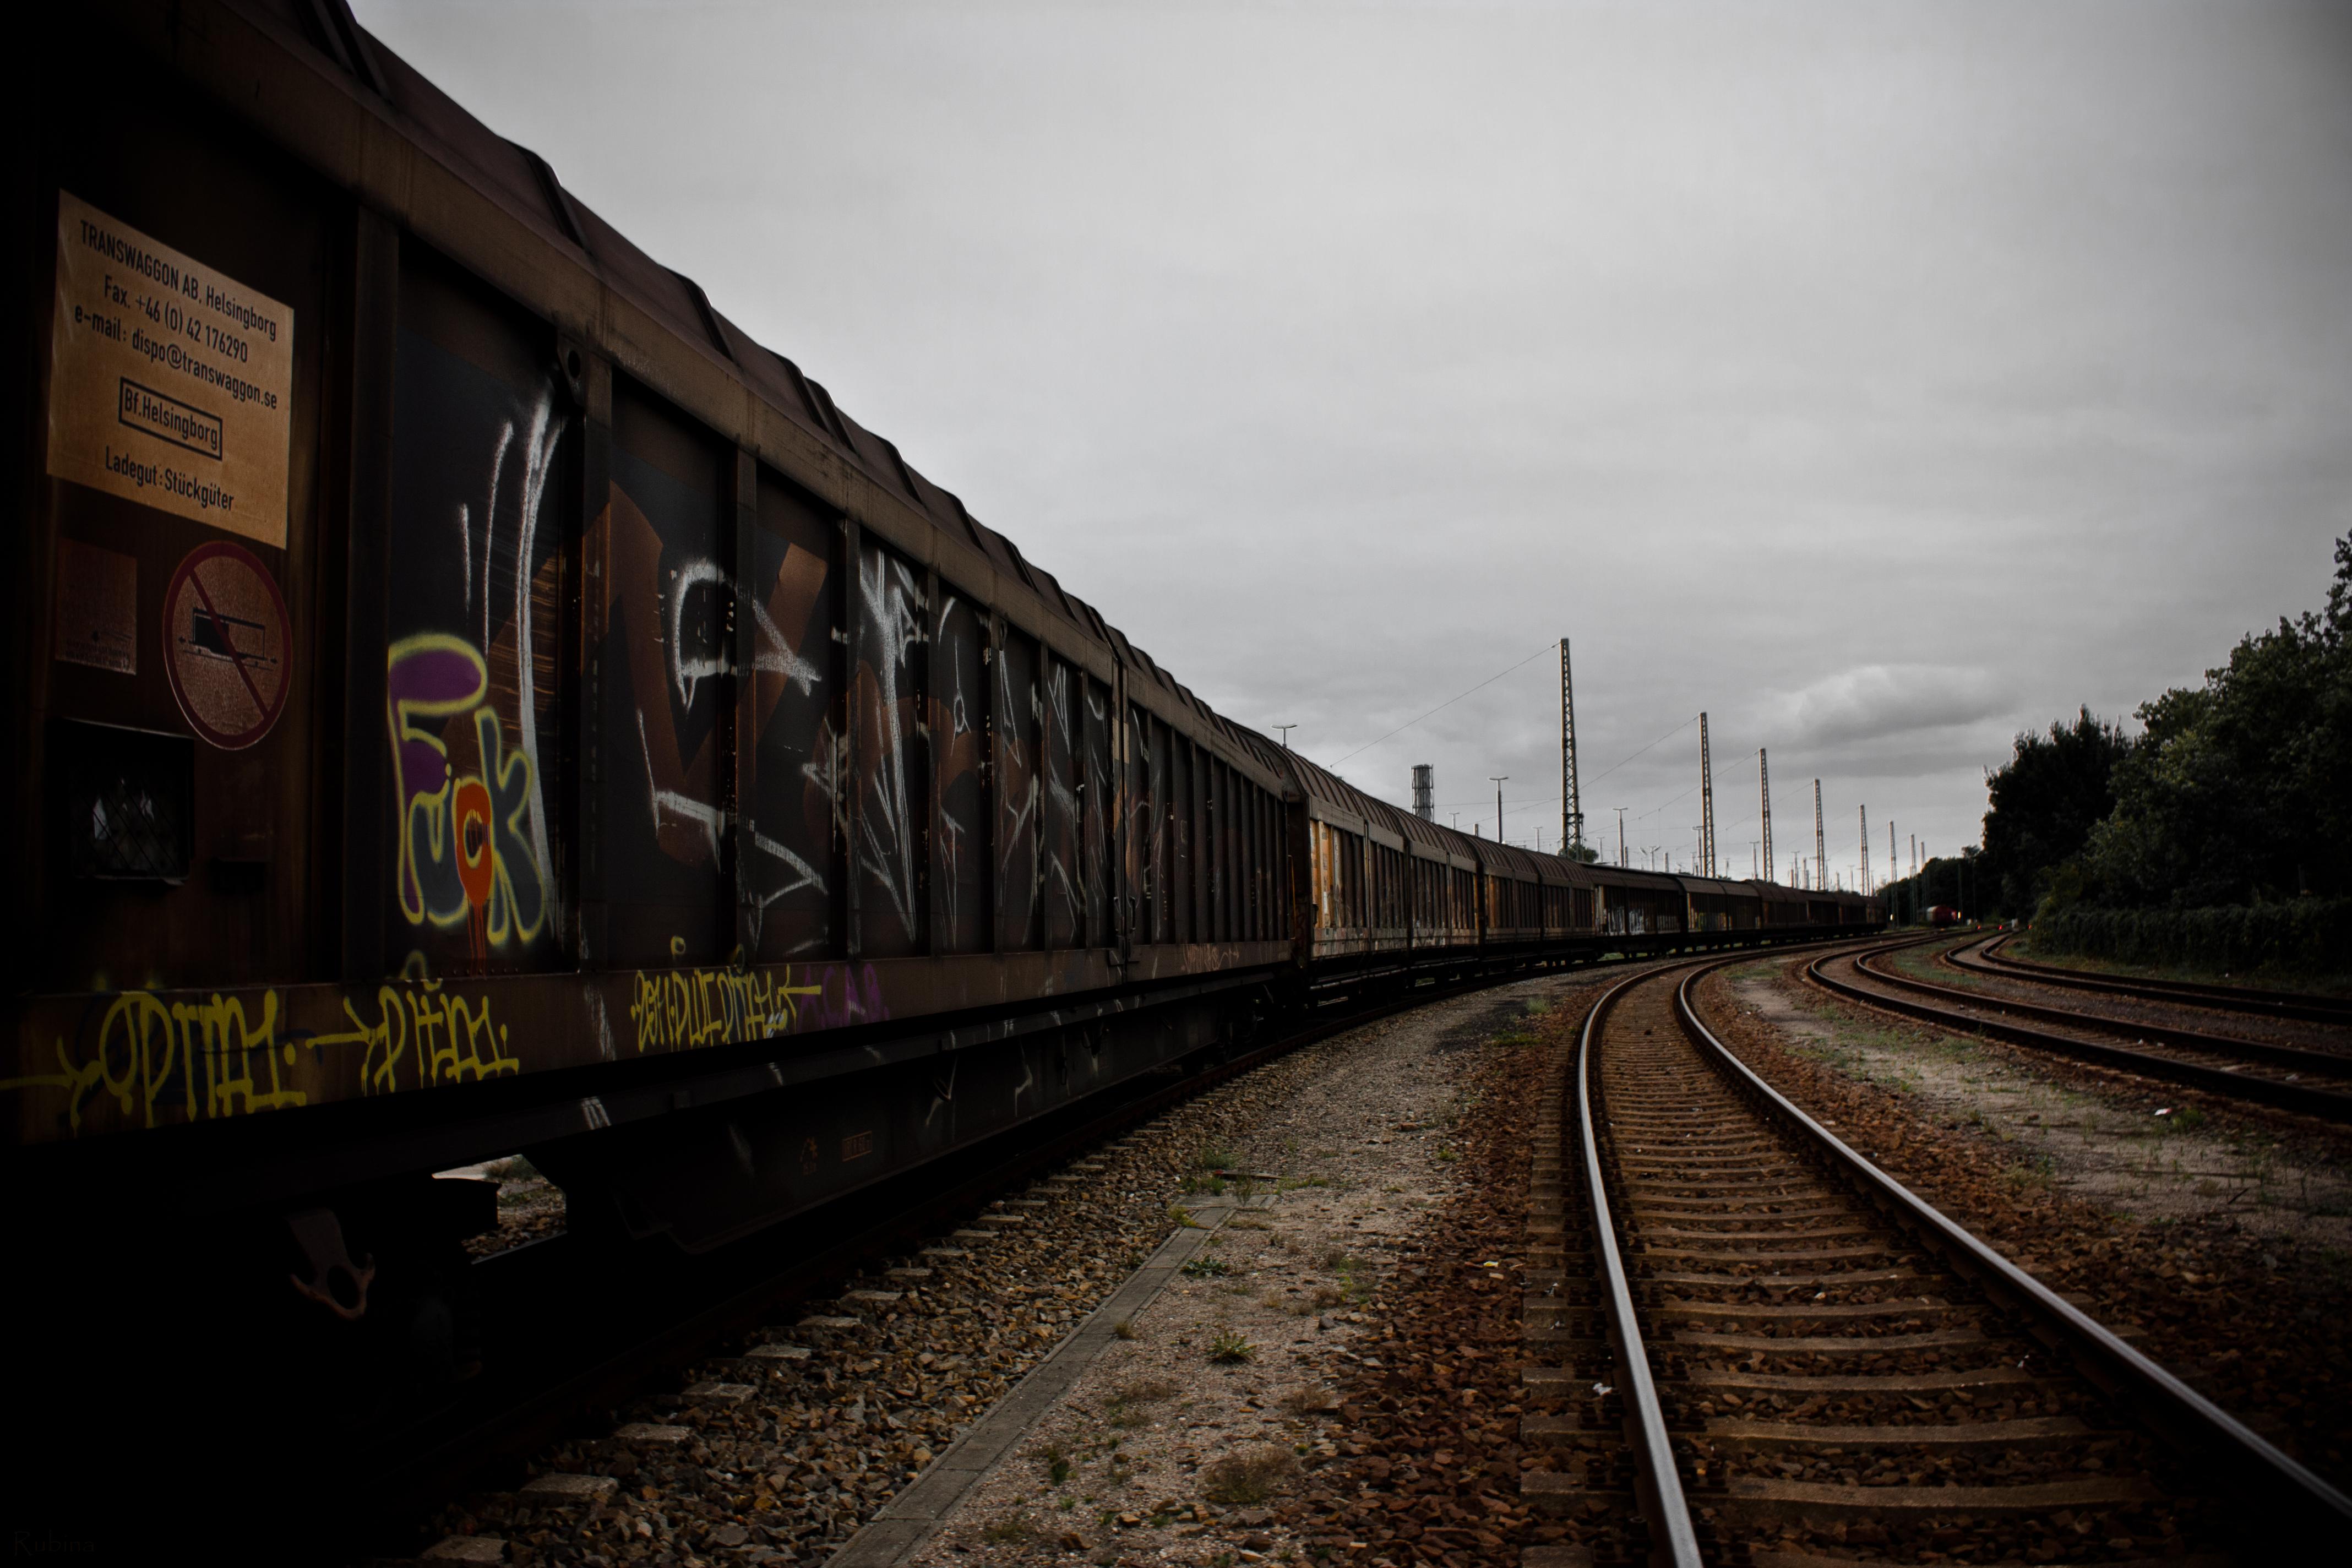 wallpaper sky vehicle train station rust metal. Black Bedroom Furniture Sets. Home Design Ideas